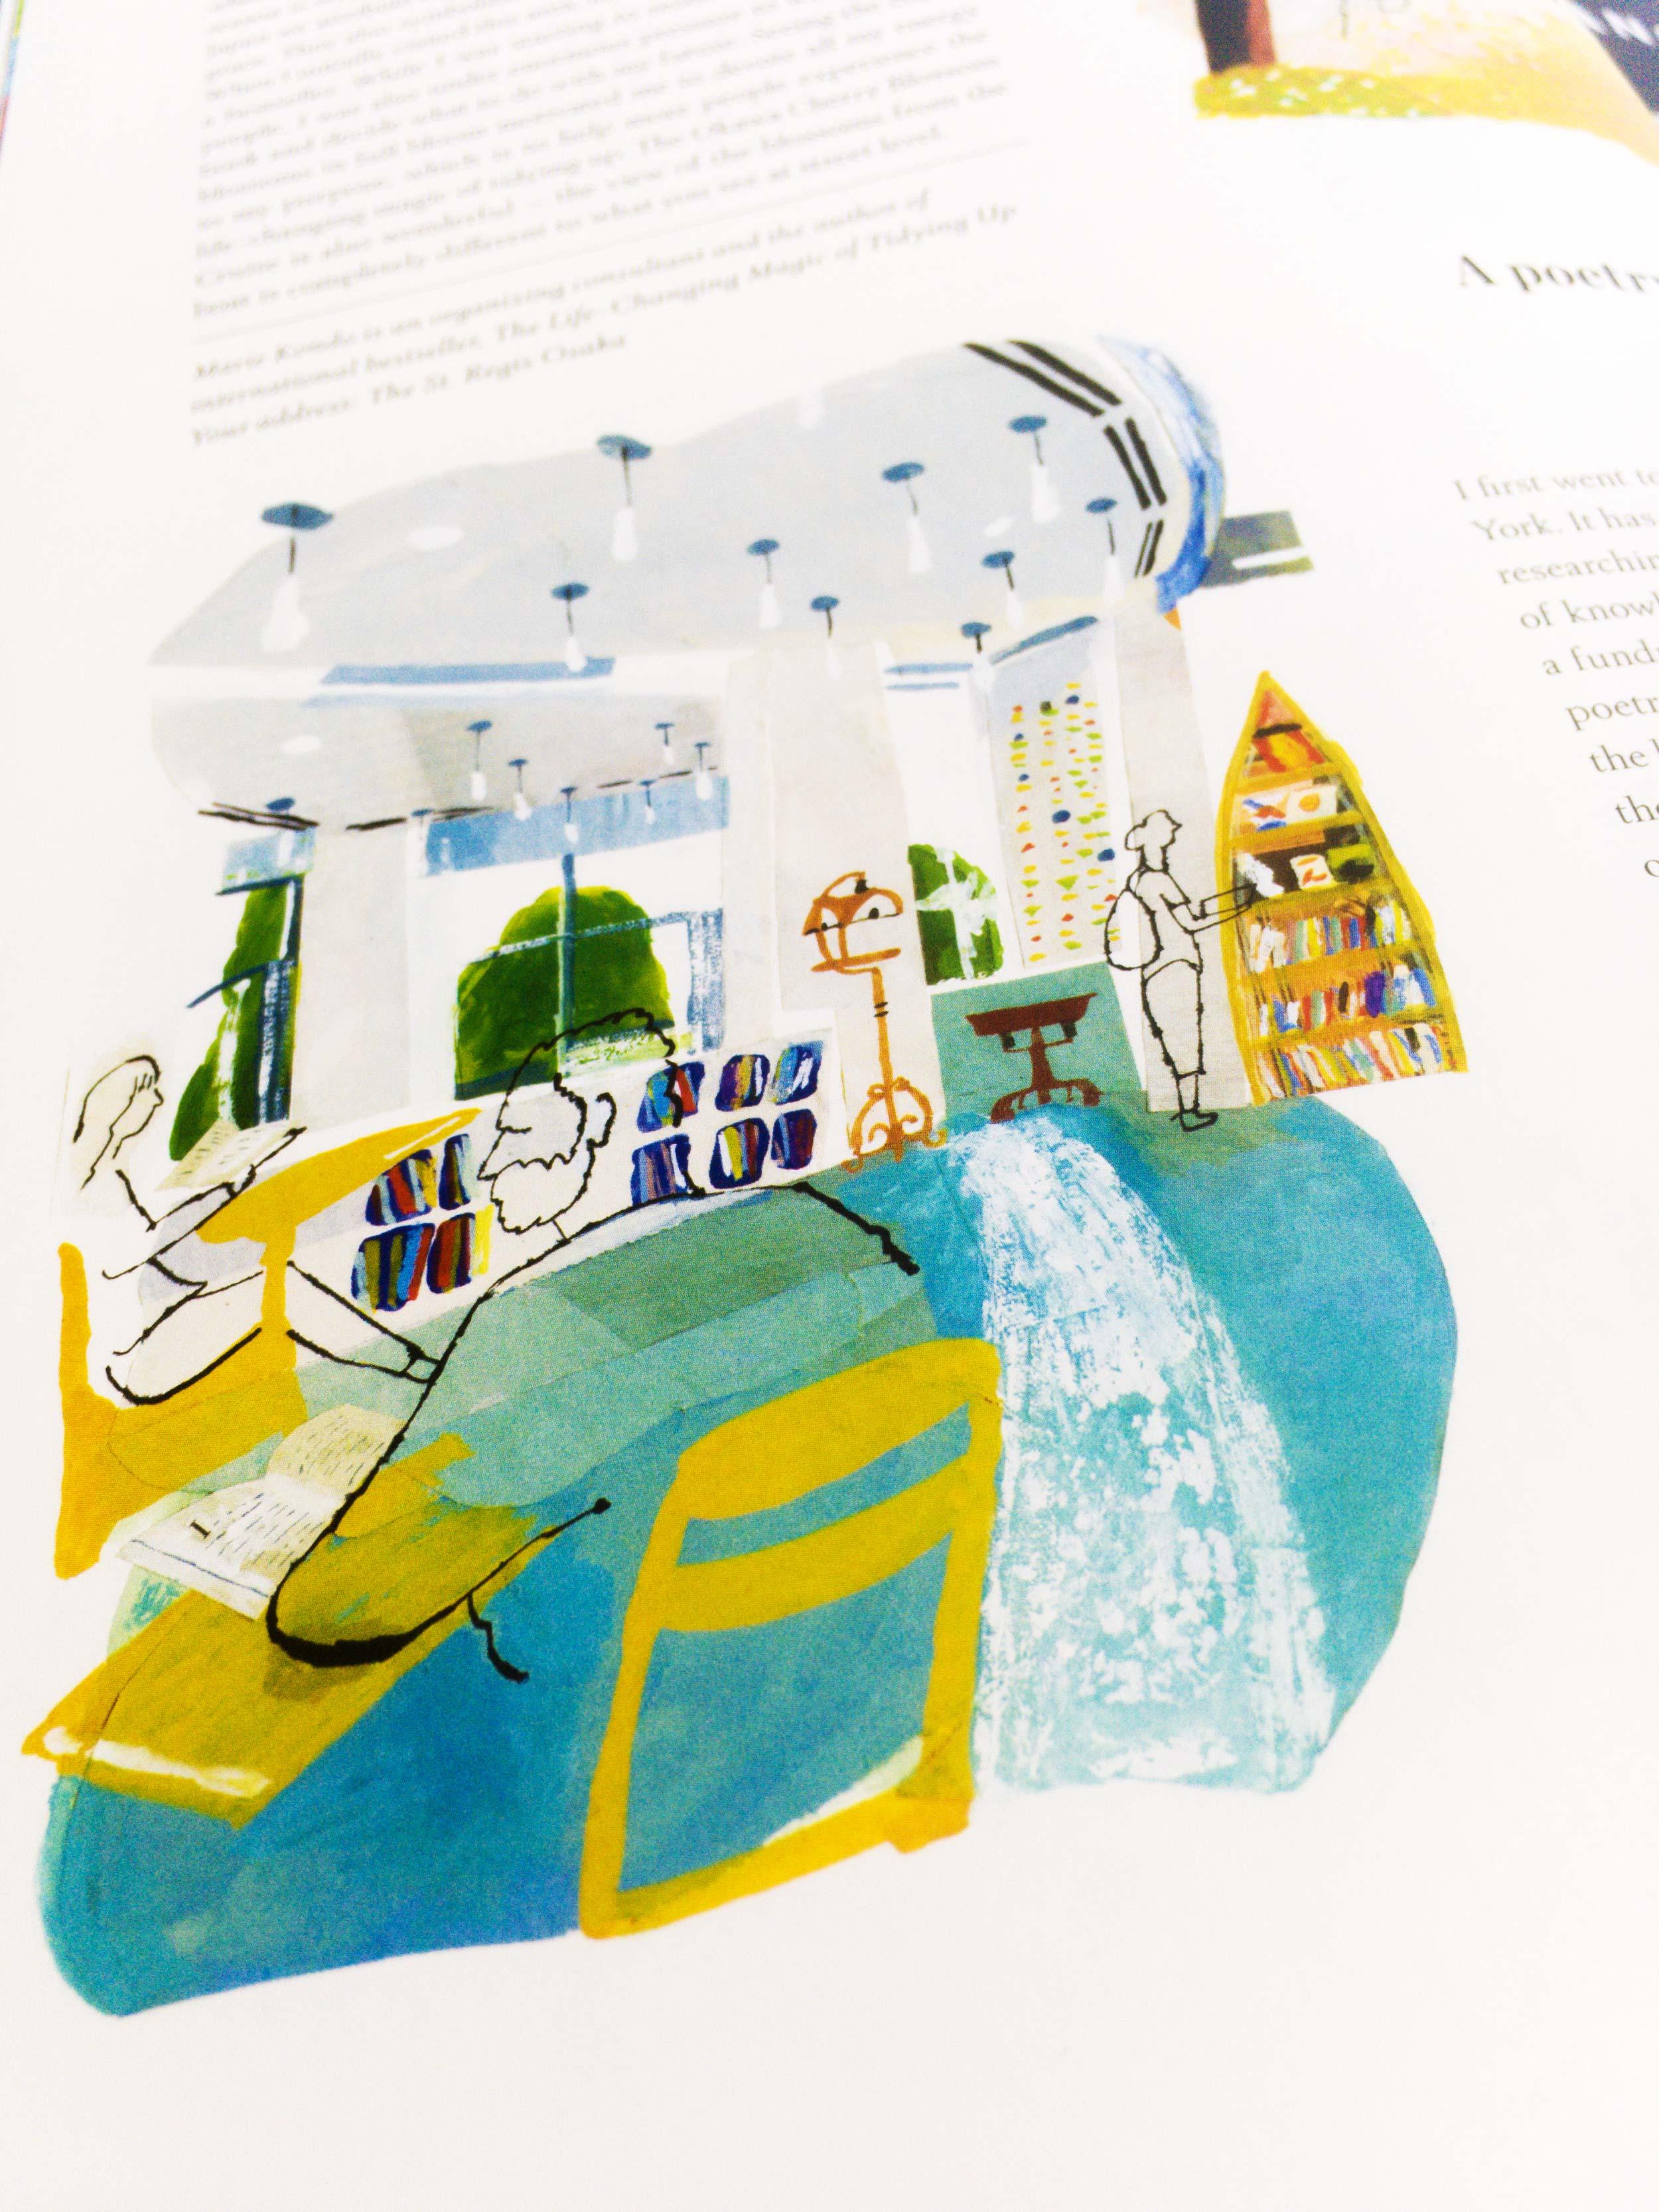 St Regis Beyond illustrations by James Oses, image 5